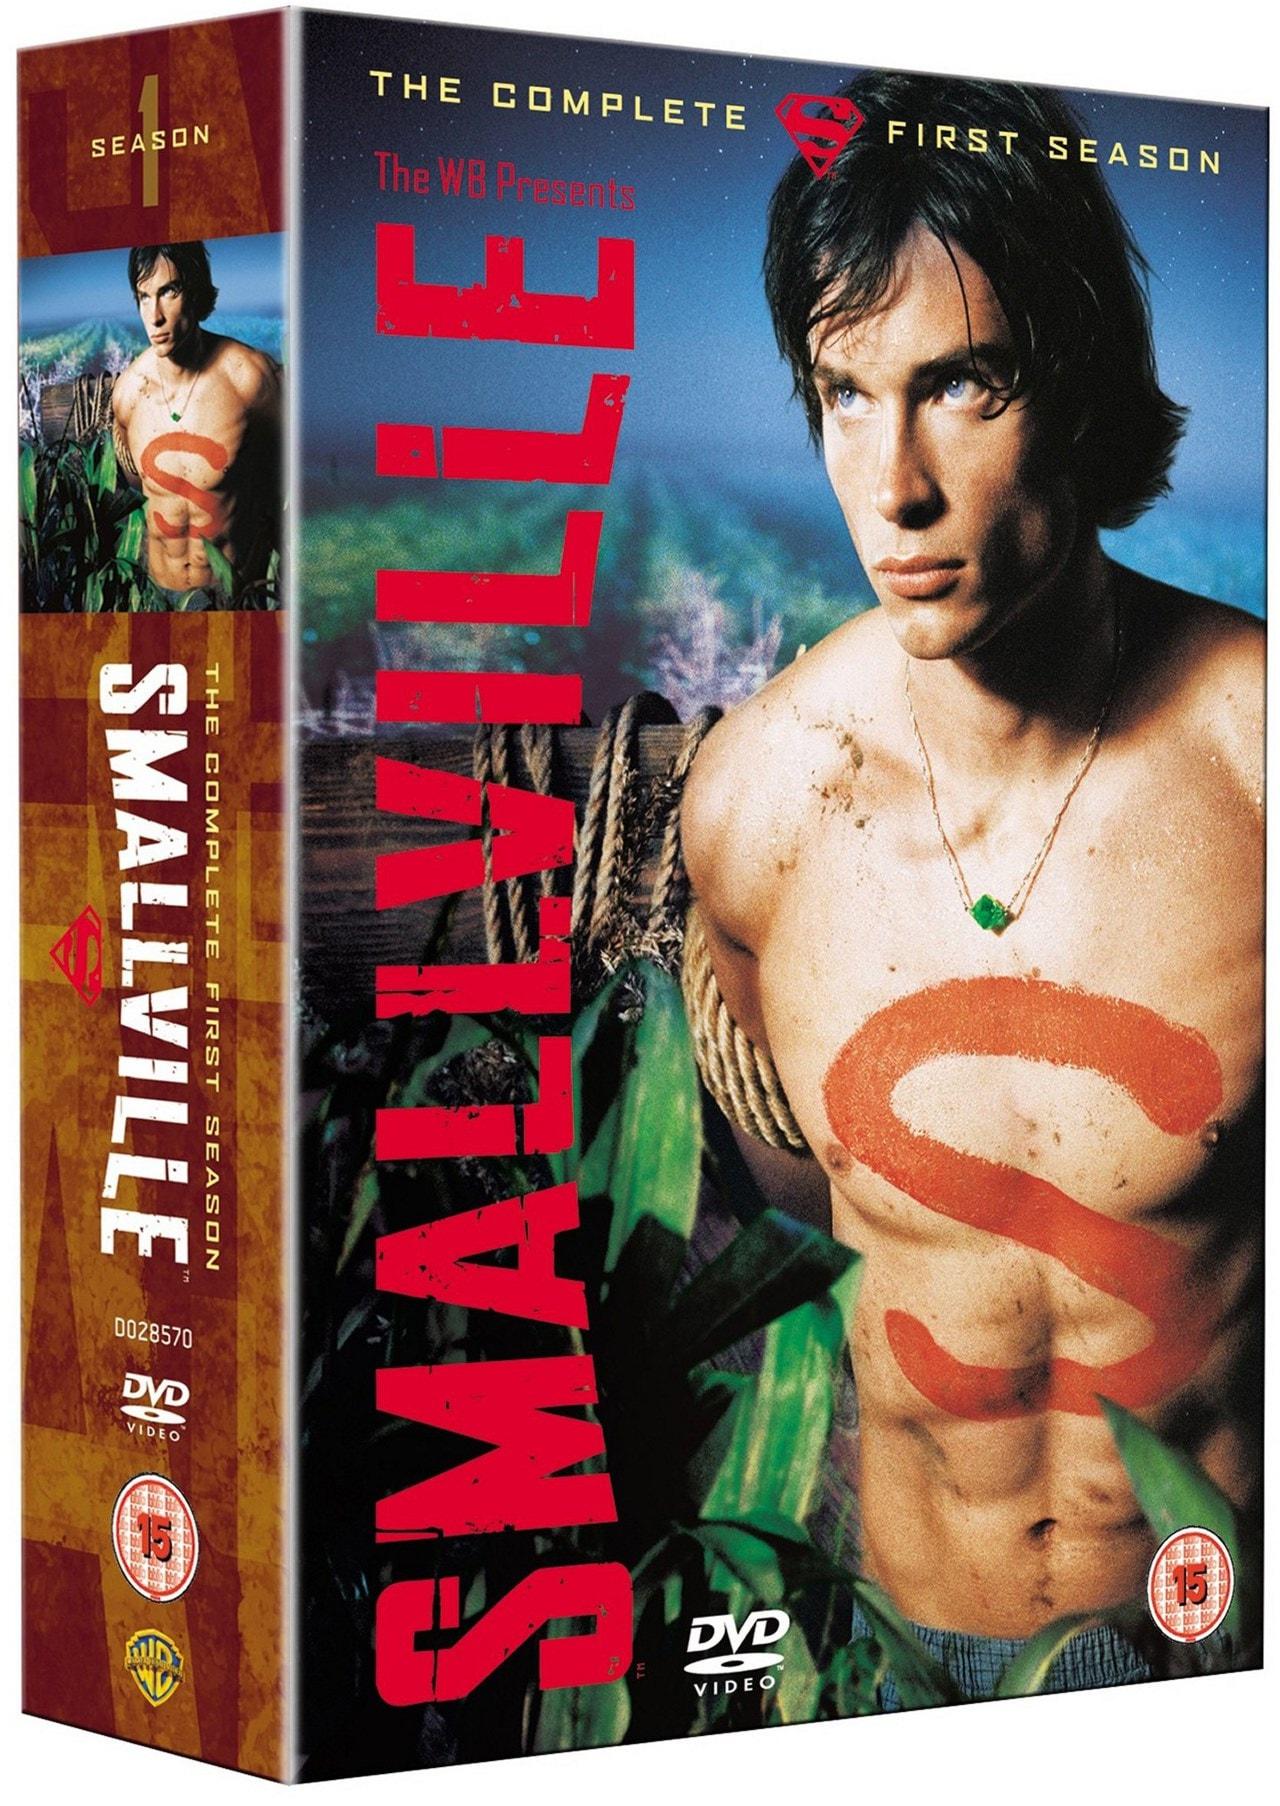 Smallville: The Complete First Season - 2